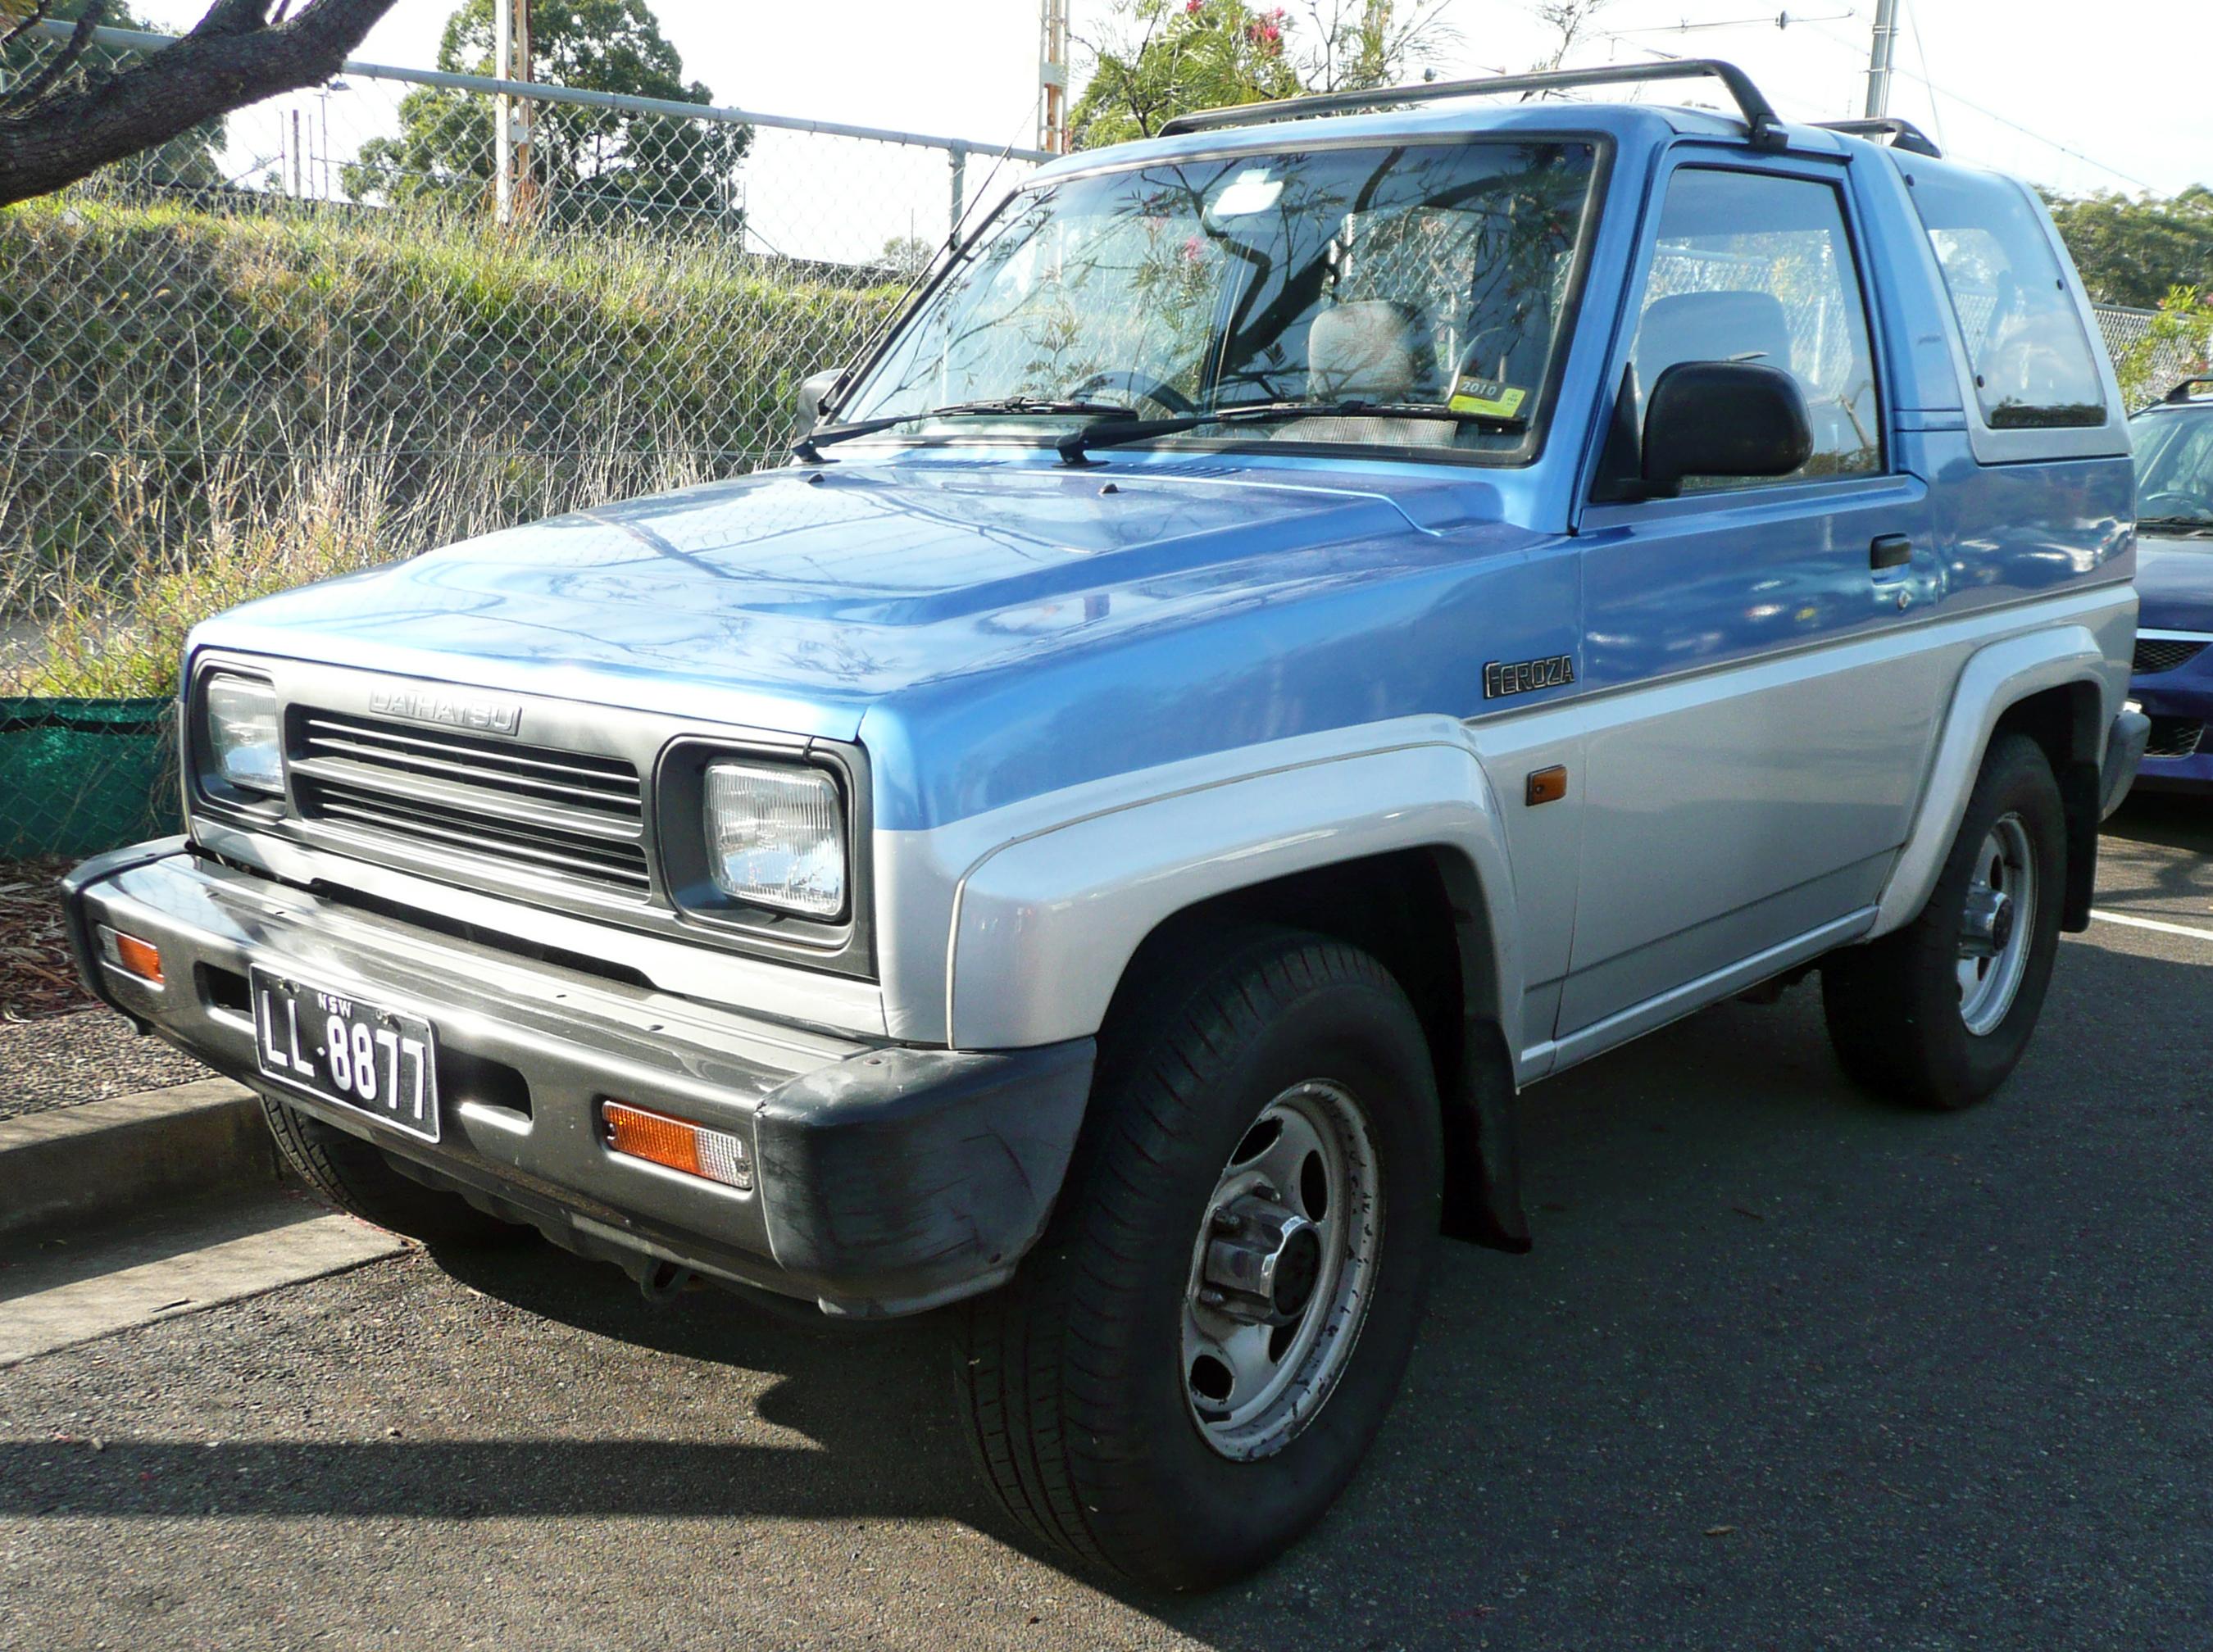 Daihatsu Feroza 1989 - 1999 SUV 3 door #4